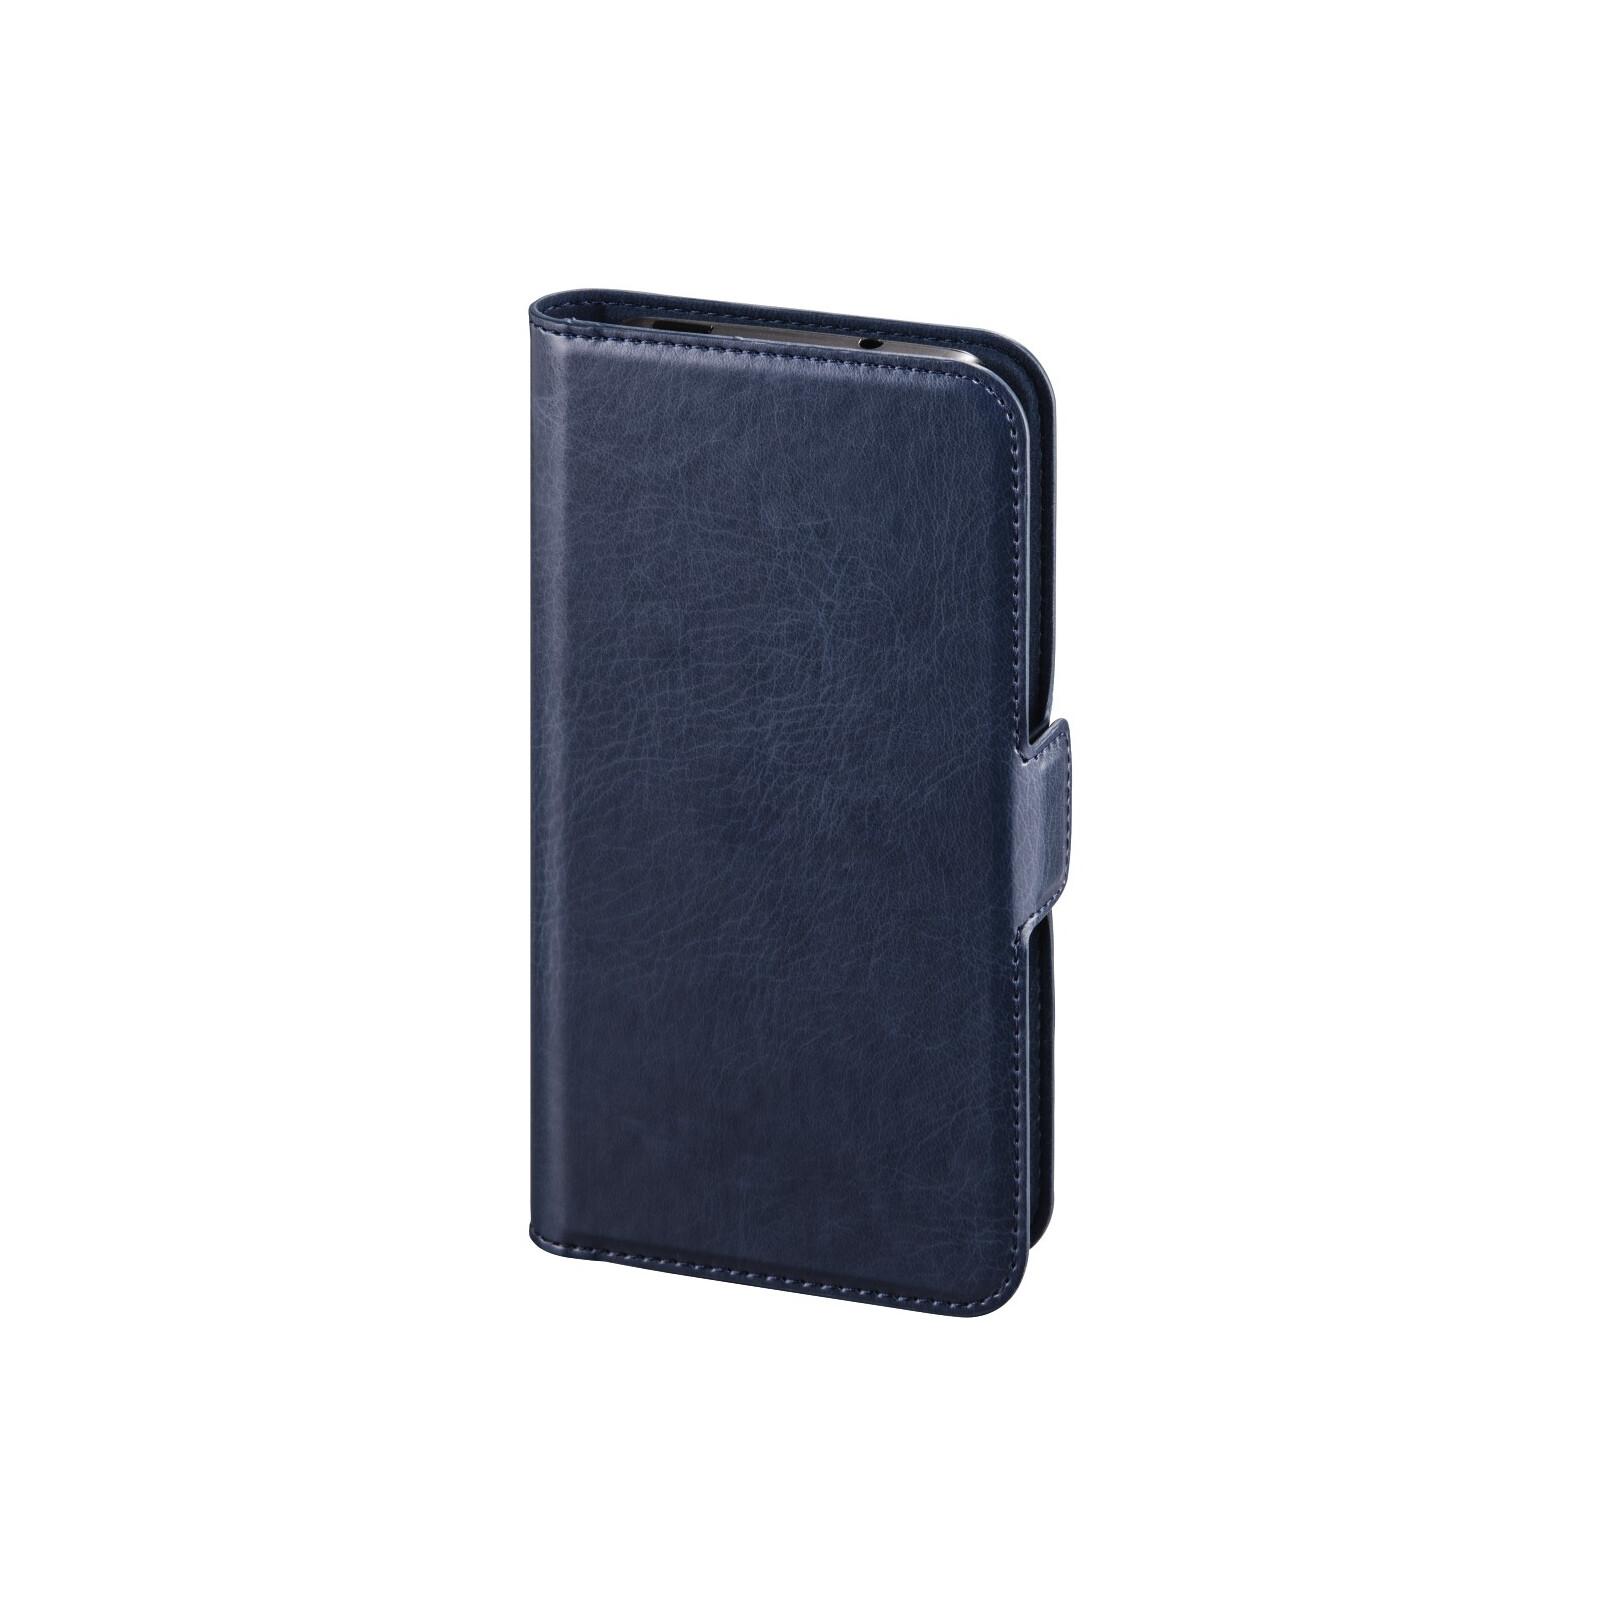 "Hama Book Tasche Gr. L (4,0 - 4,5"")"